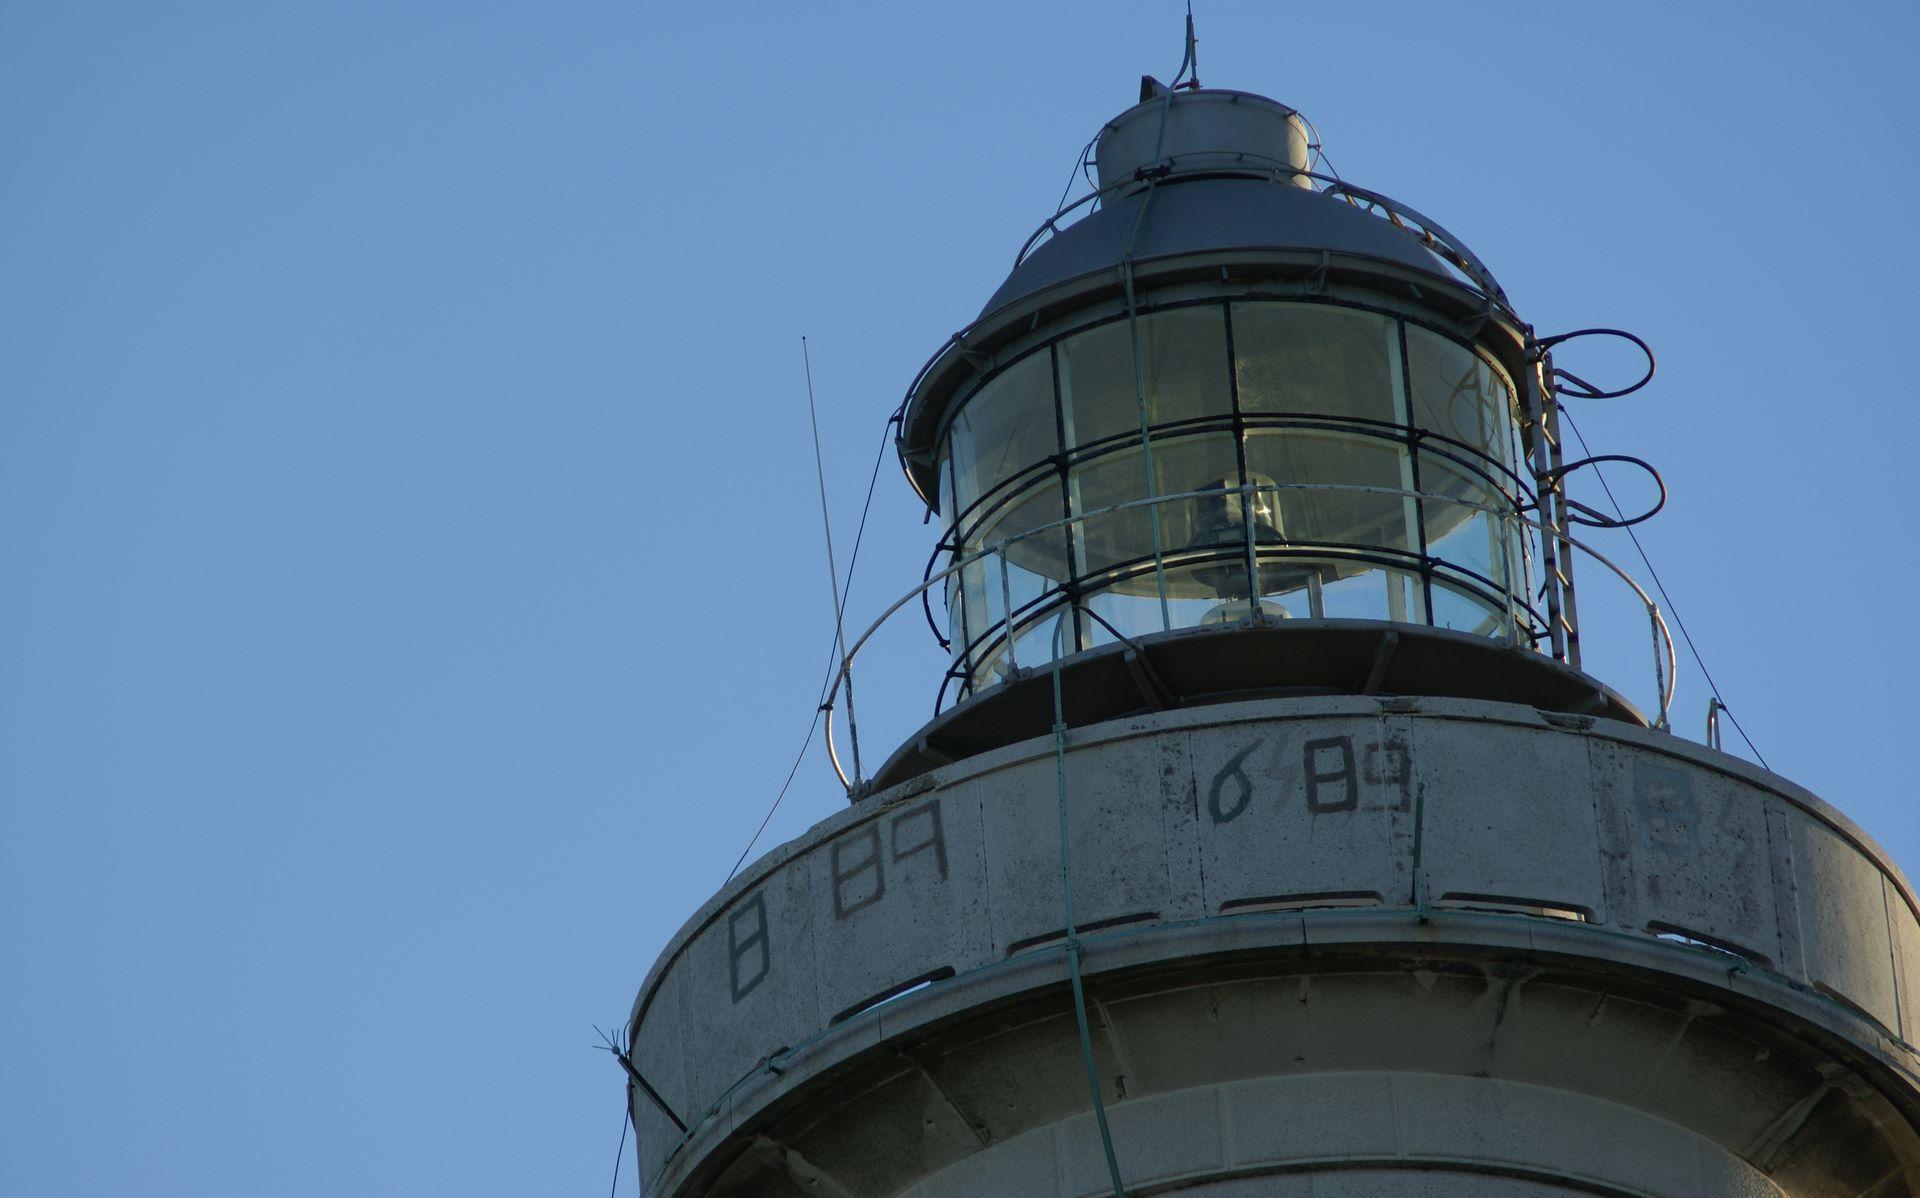 beautiful Lighthouse wallpaper 16:10 1920x1200, high resolution photo of